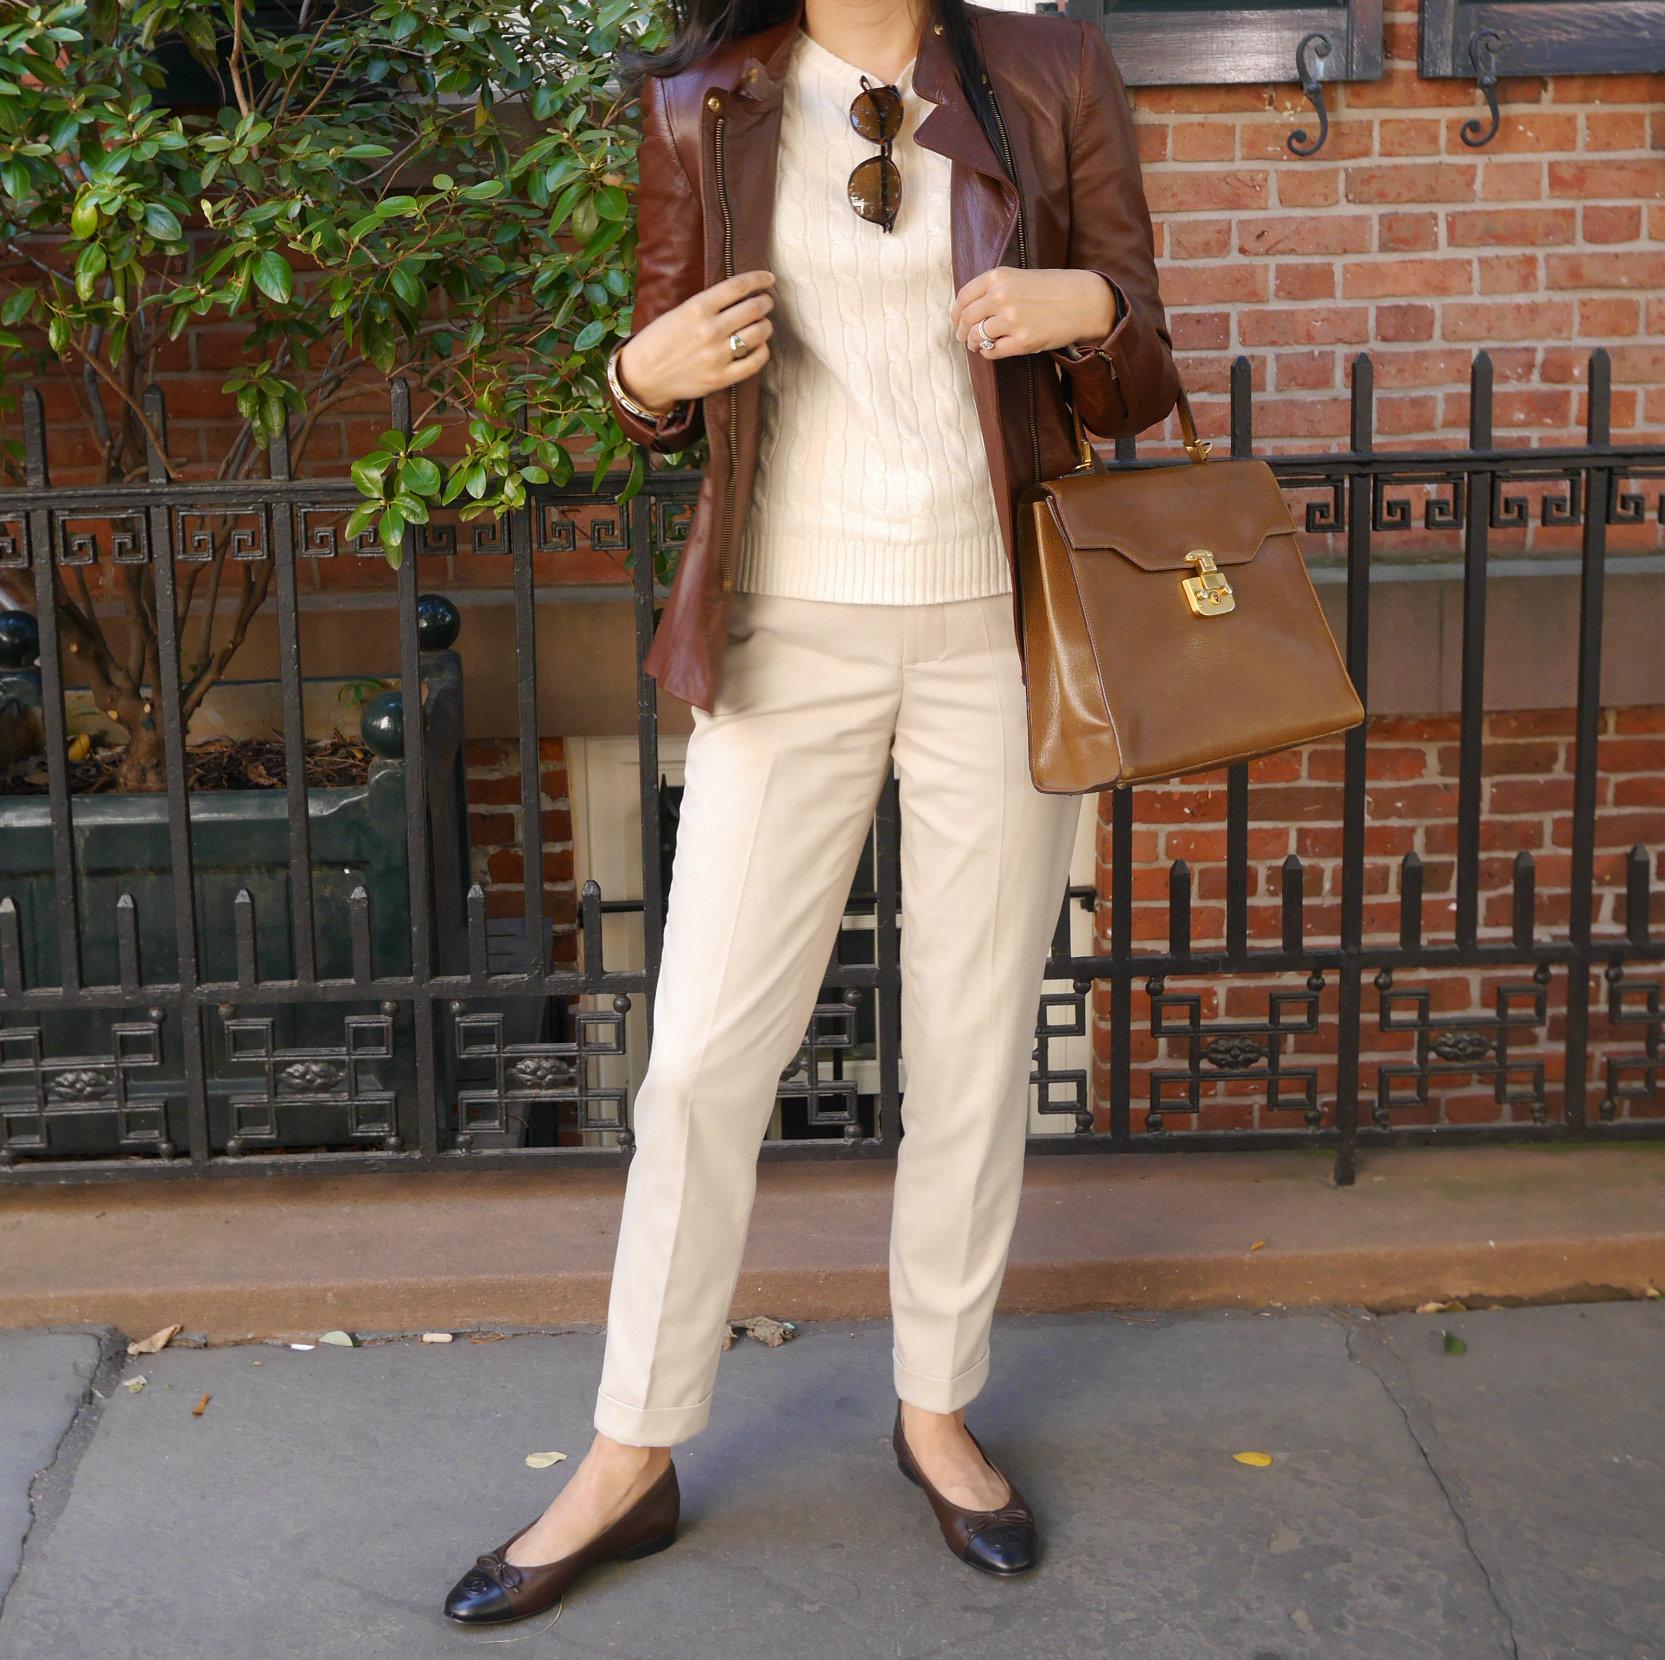 Zara+Leather+Jacket+Zara+Pants+Vintage+Gucci+Bag+Chanel+Flats+Cashmere+Sweater.jpeg